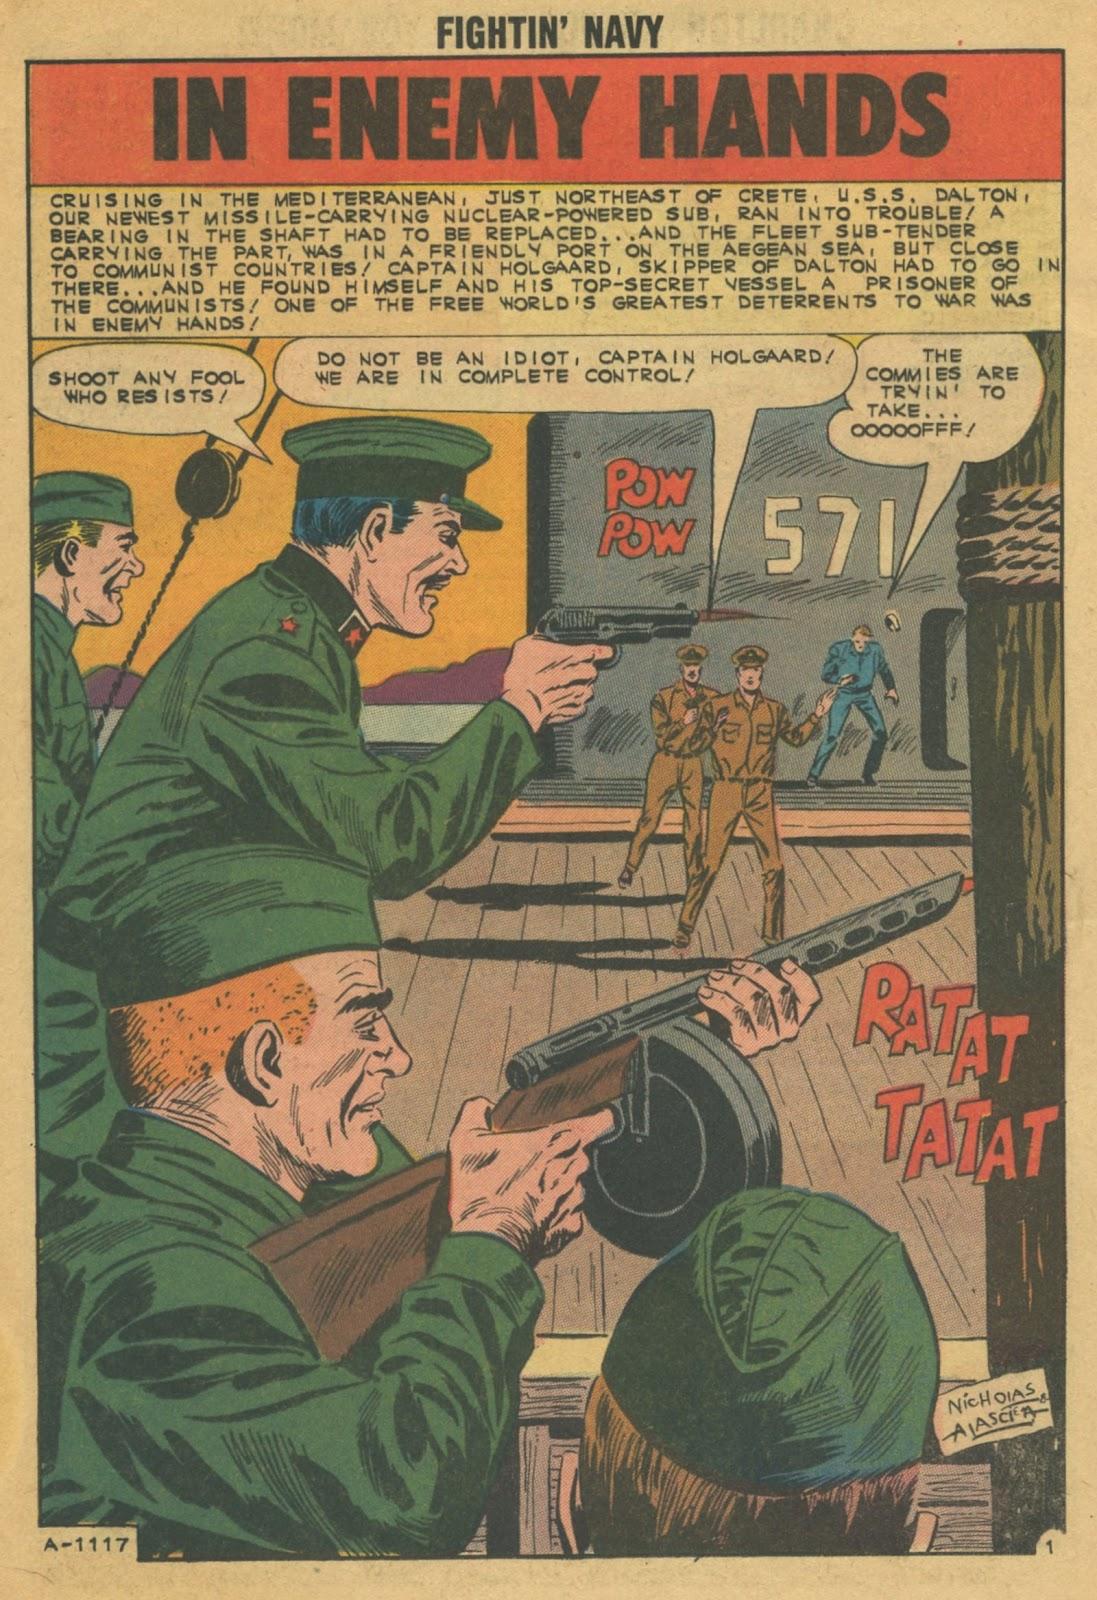 Read online Fightin' Navy comic -  Issue #103 - 12